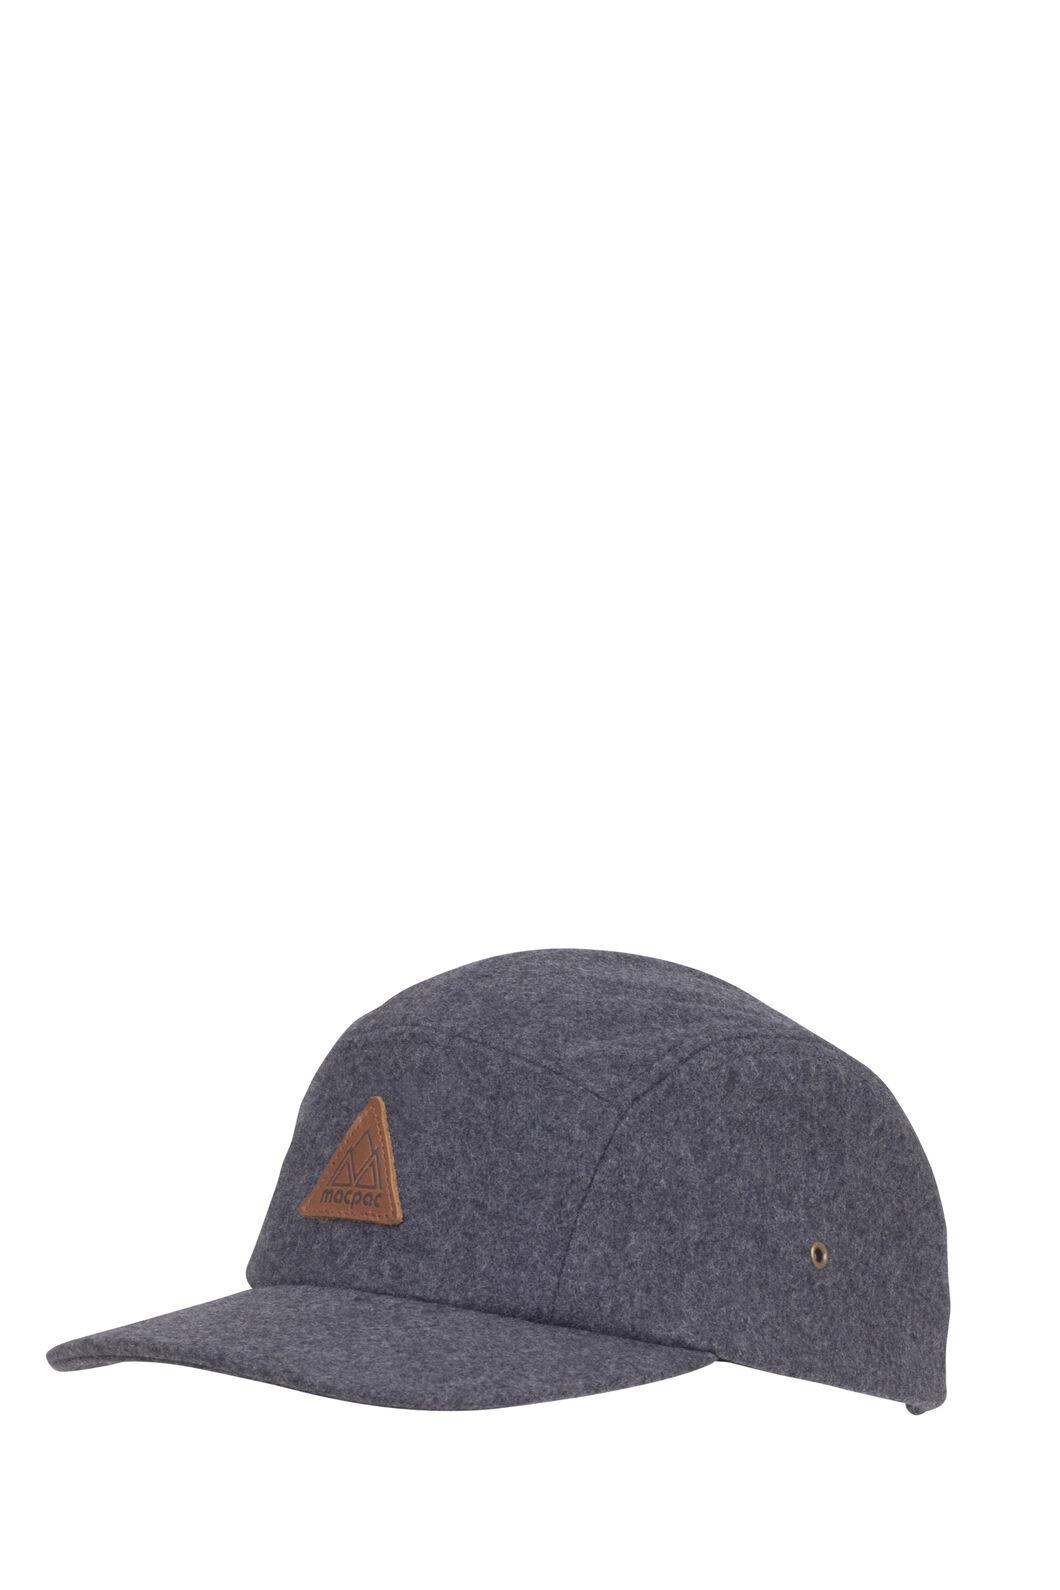 Macpac Wool Blend 5-Panel Hat, Grey, hi-res